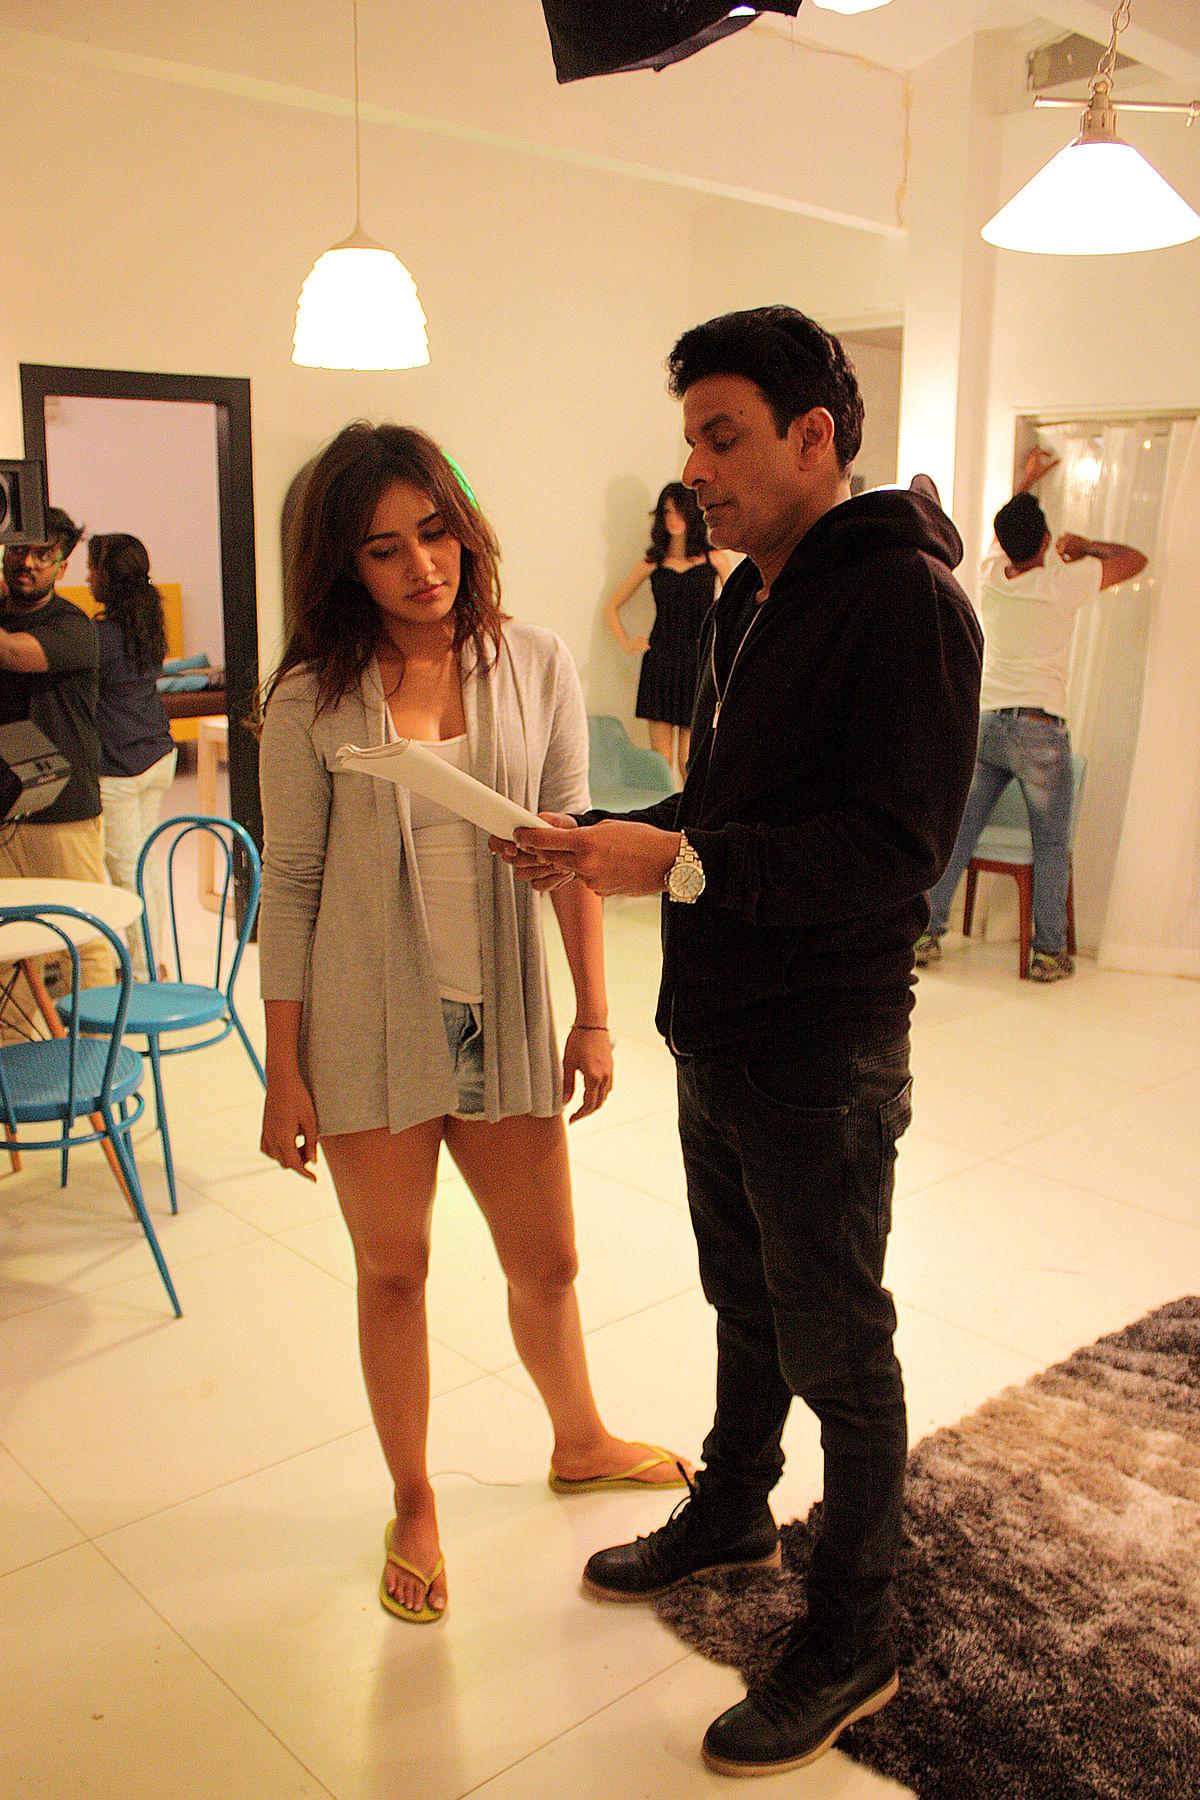 Manoj Bajpayee discusses a scene with Neha Sharma on the sets of Shirish Kunder's short film <i>Kriti. </i>(Photo courtesy: Image Smiths PR Team)